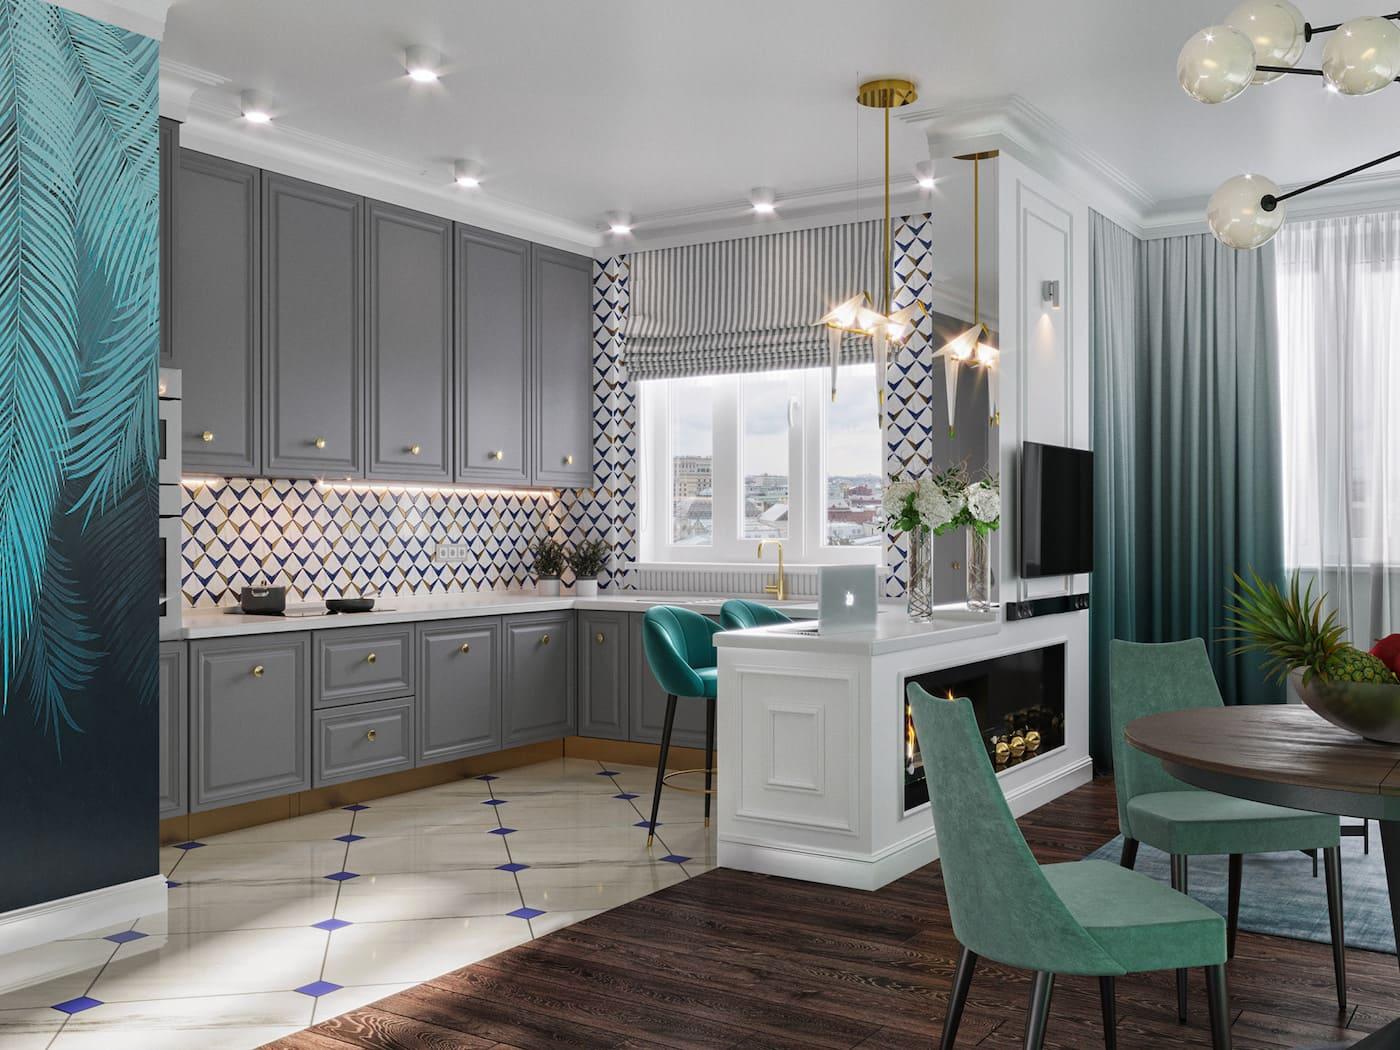 дизайн интерьера модной квартиры фото 31